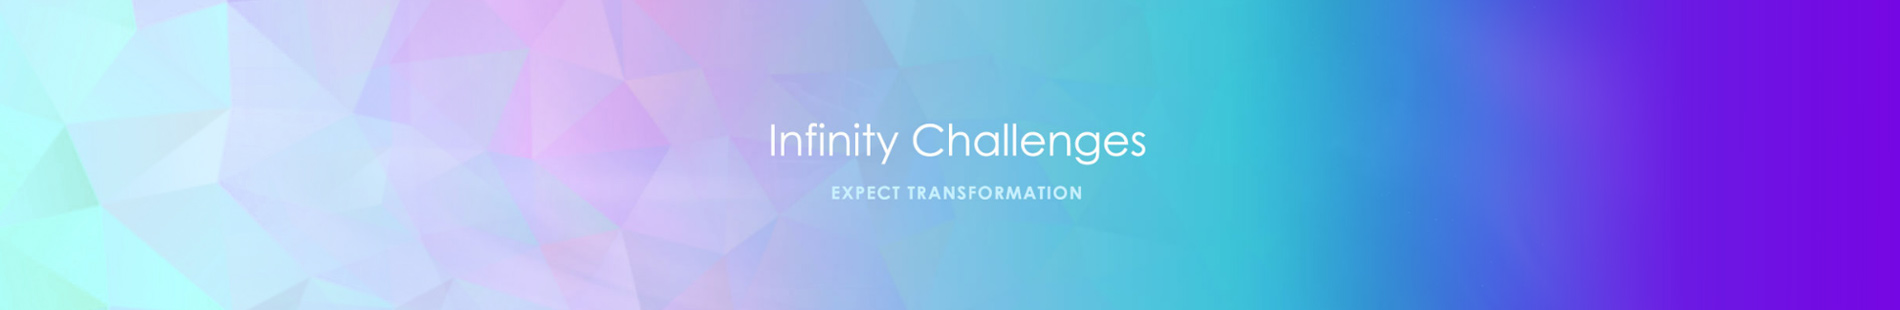 Infinity Challenges